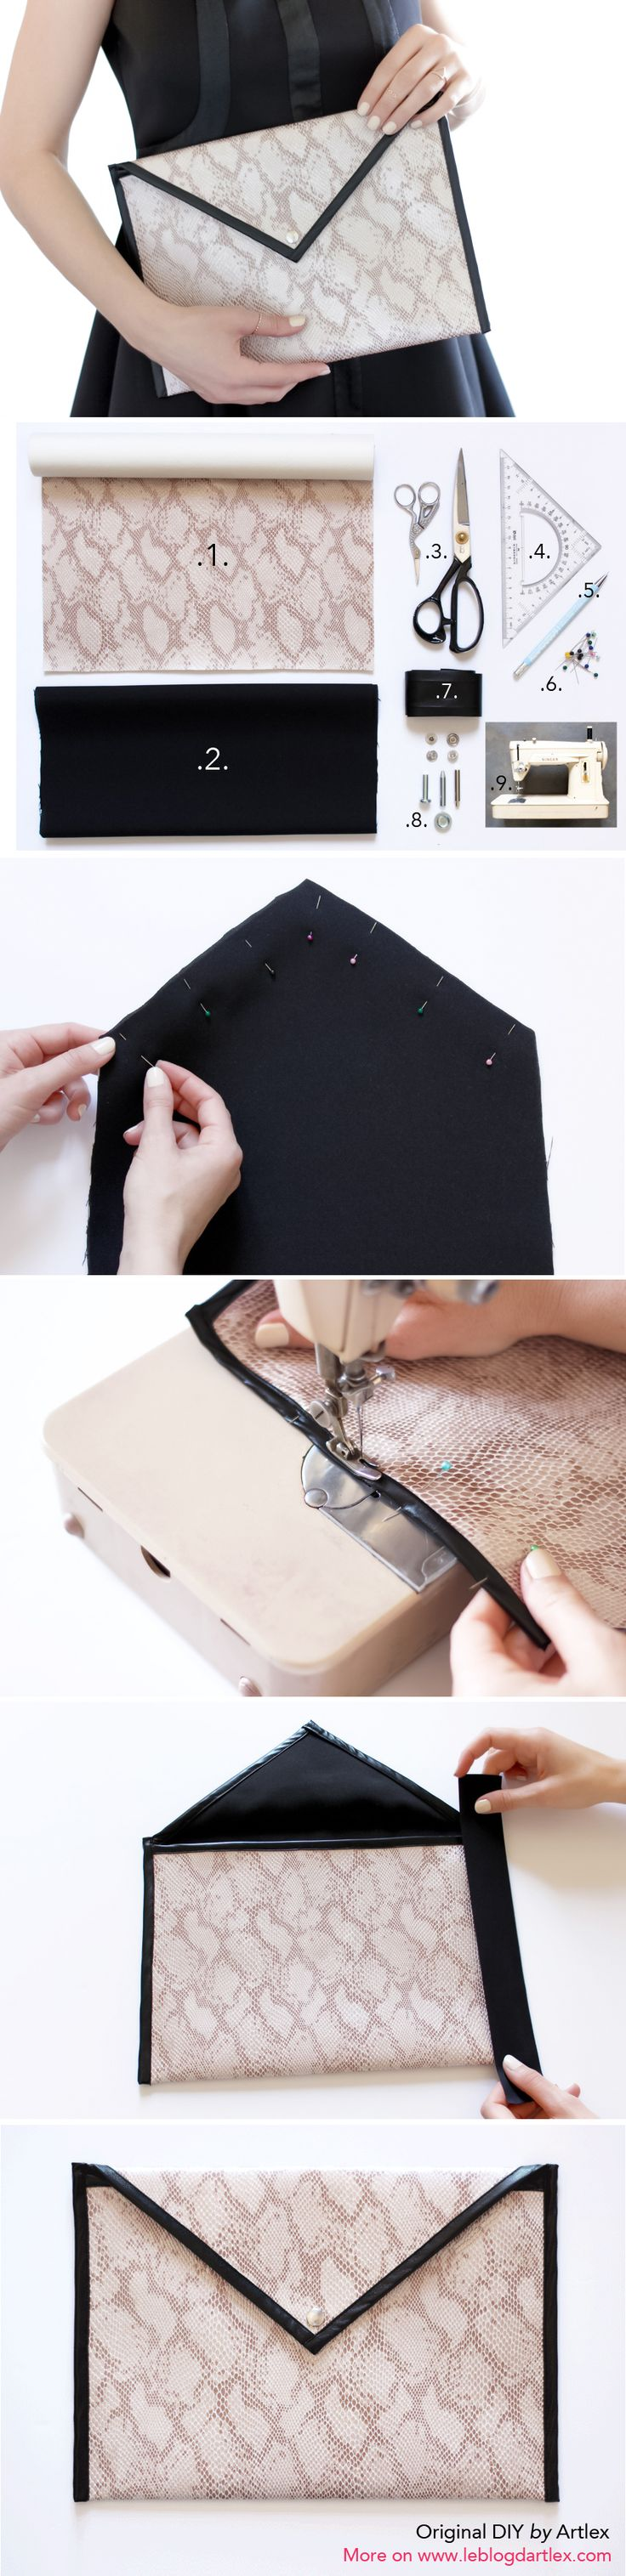 DIY pochette enveloppe / DIY pochette cuir - Blog mode & DIY Artlex // Enveloppe Clutch DIY / Leather enveloppe clutch DIY - Fashion & DIY blog Artlex